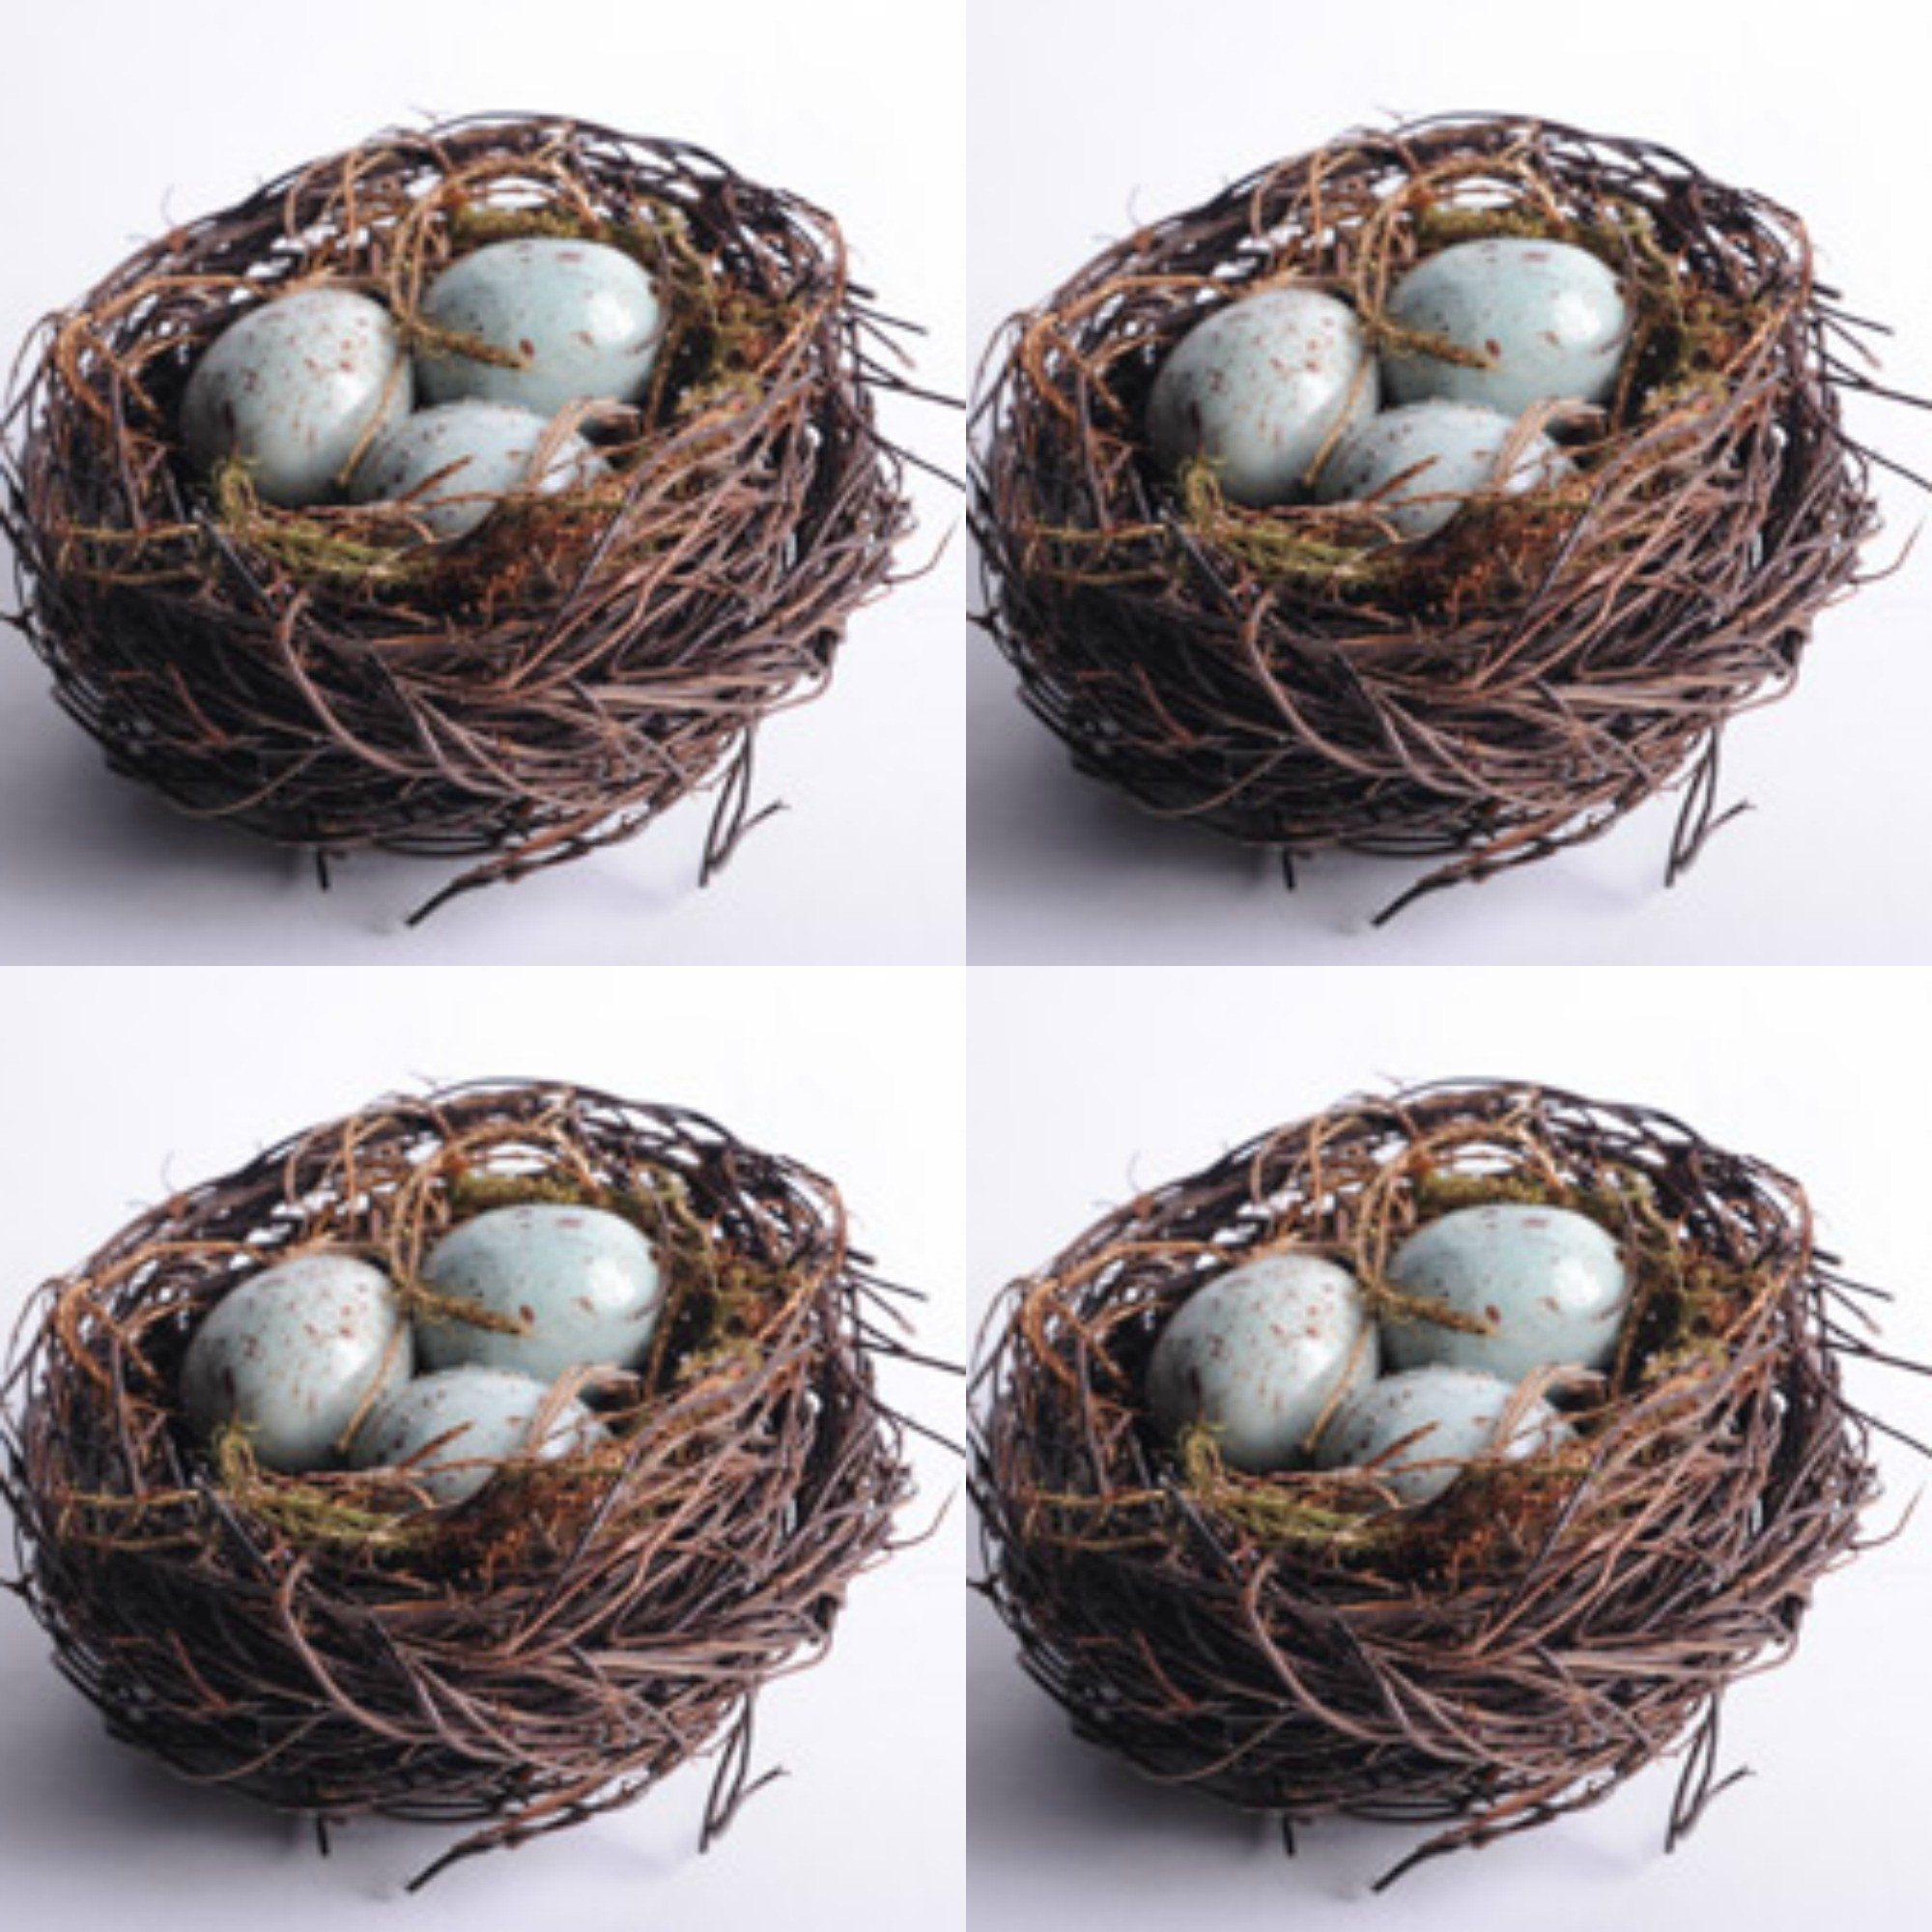 Decorative Bird Nest With Eggs, Set of 4 Decor, Rustic